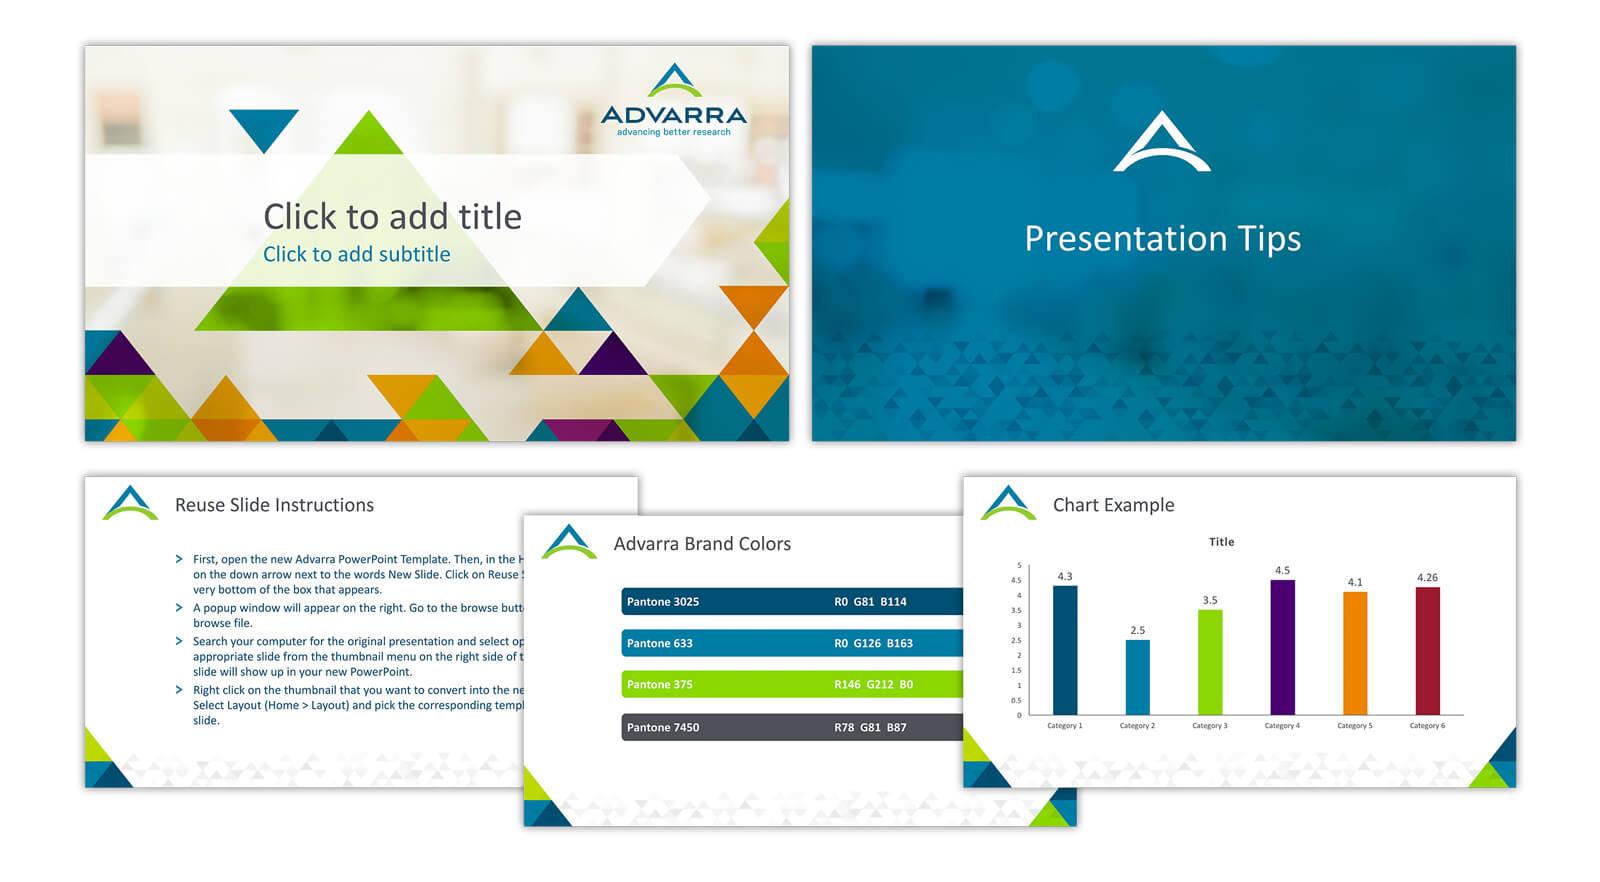 Advarra PowerPoint Template